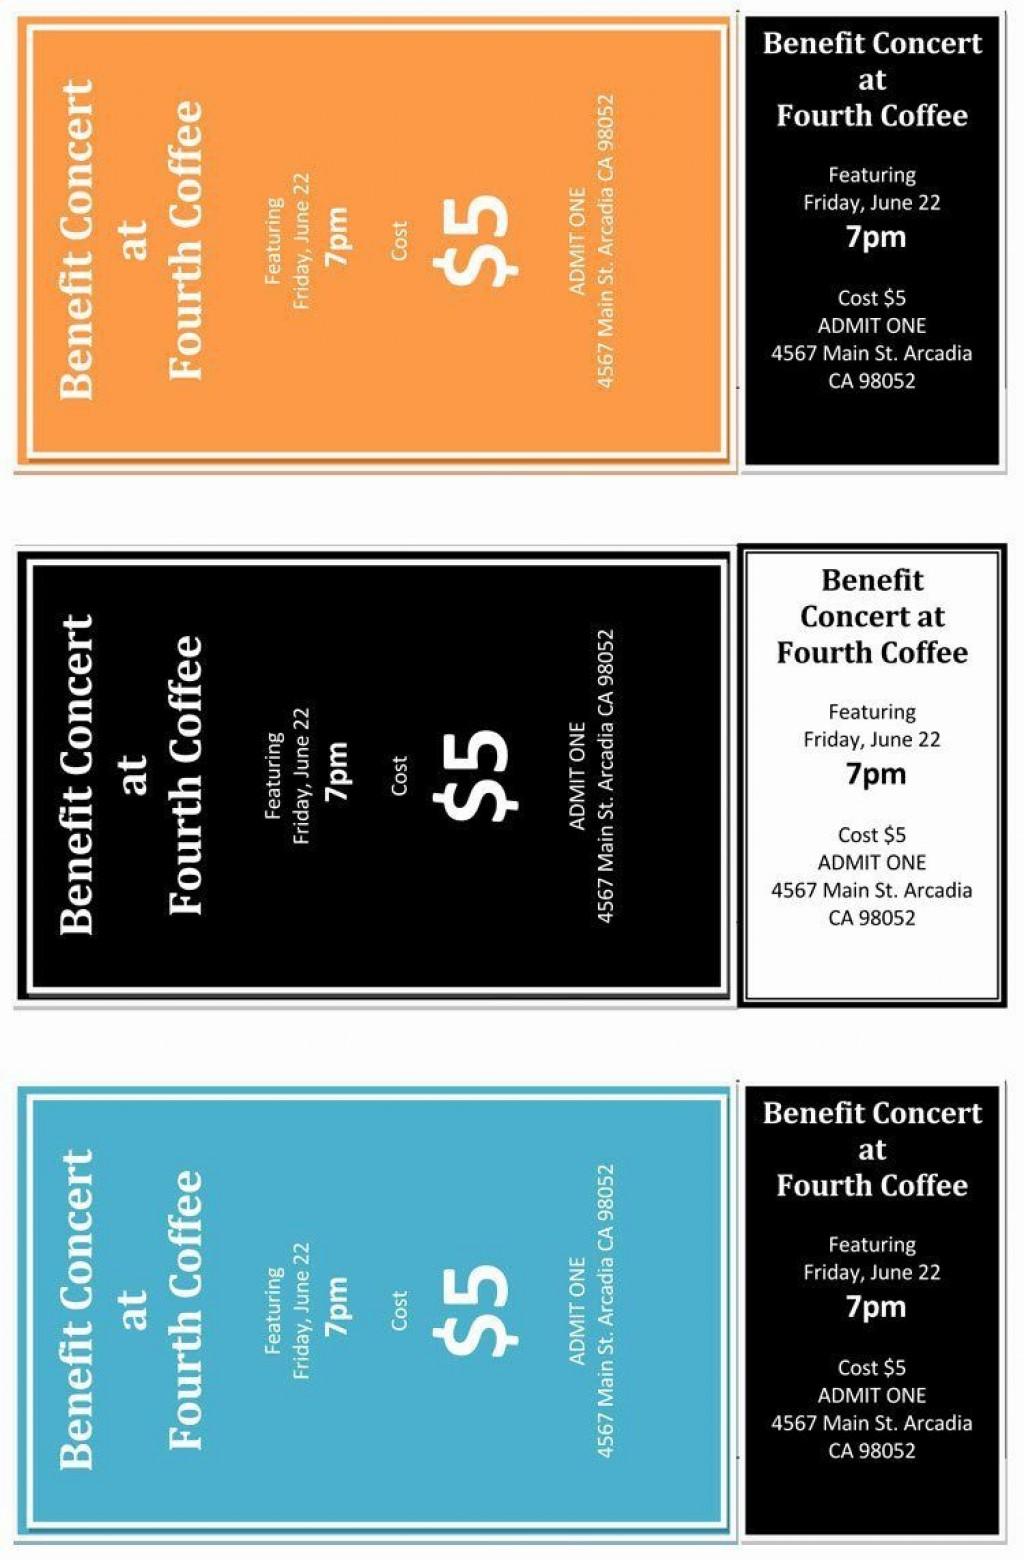 001 Wondrou Concert Ticket Template Word Highest Clarity  Free MicrosoftLarge